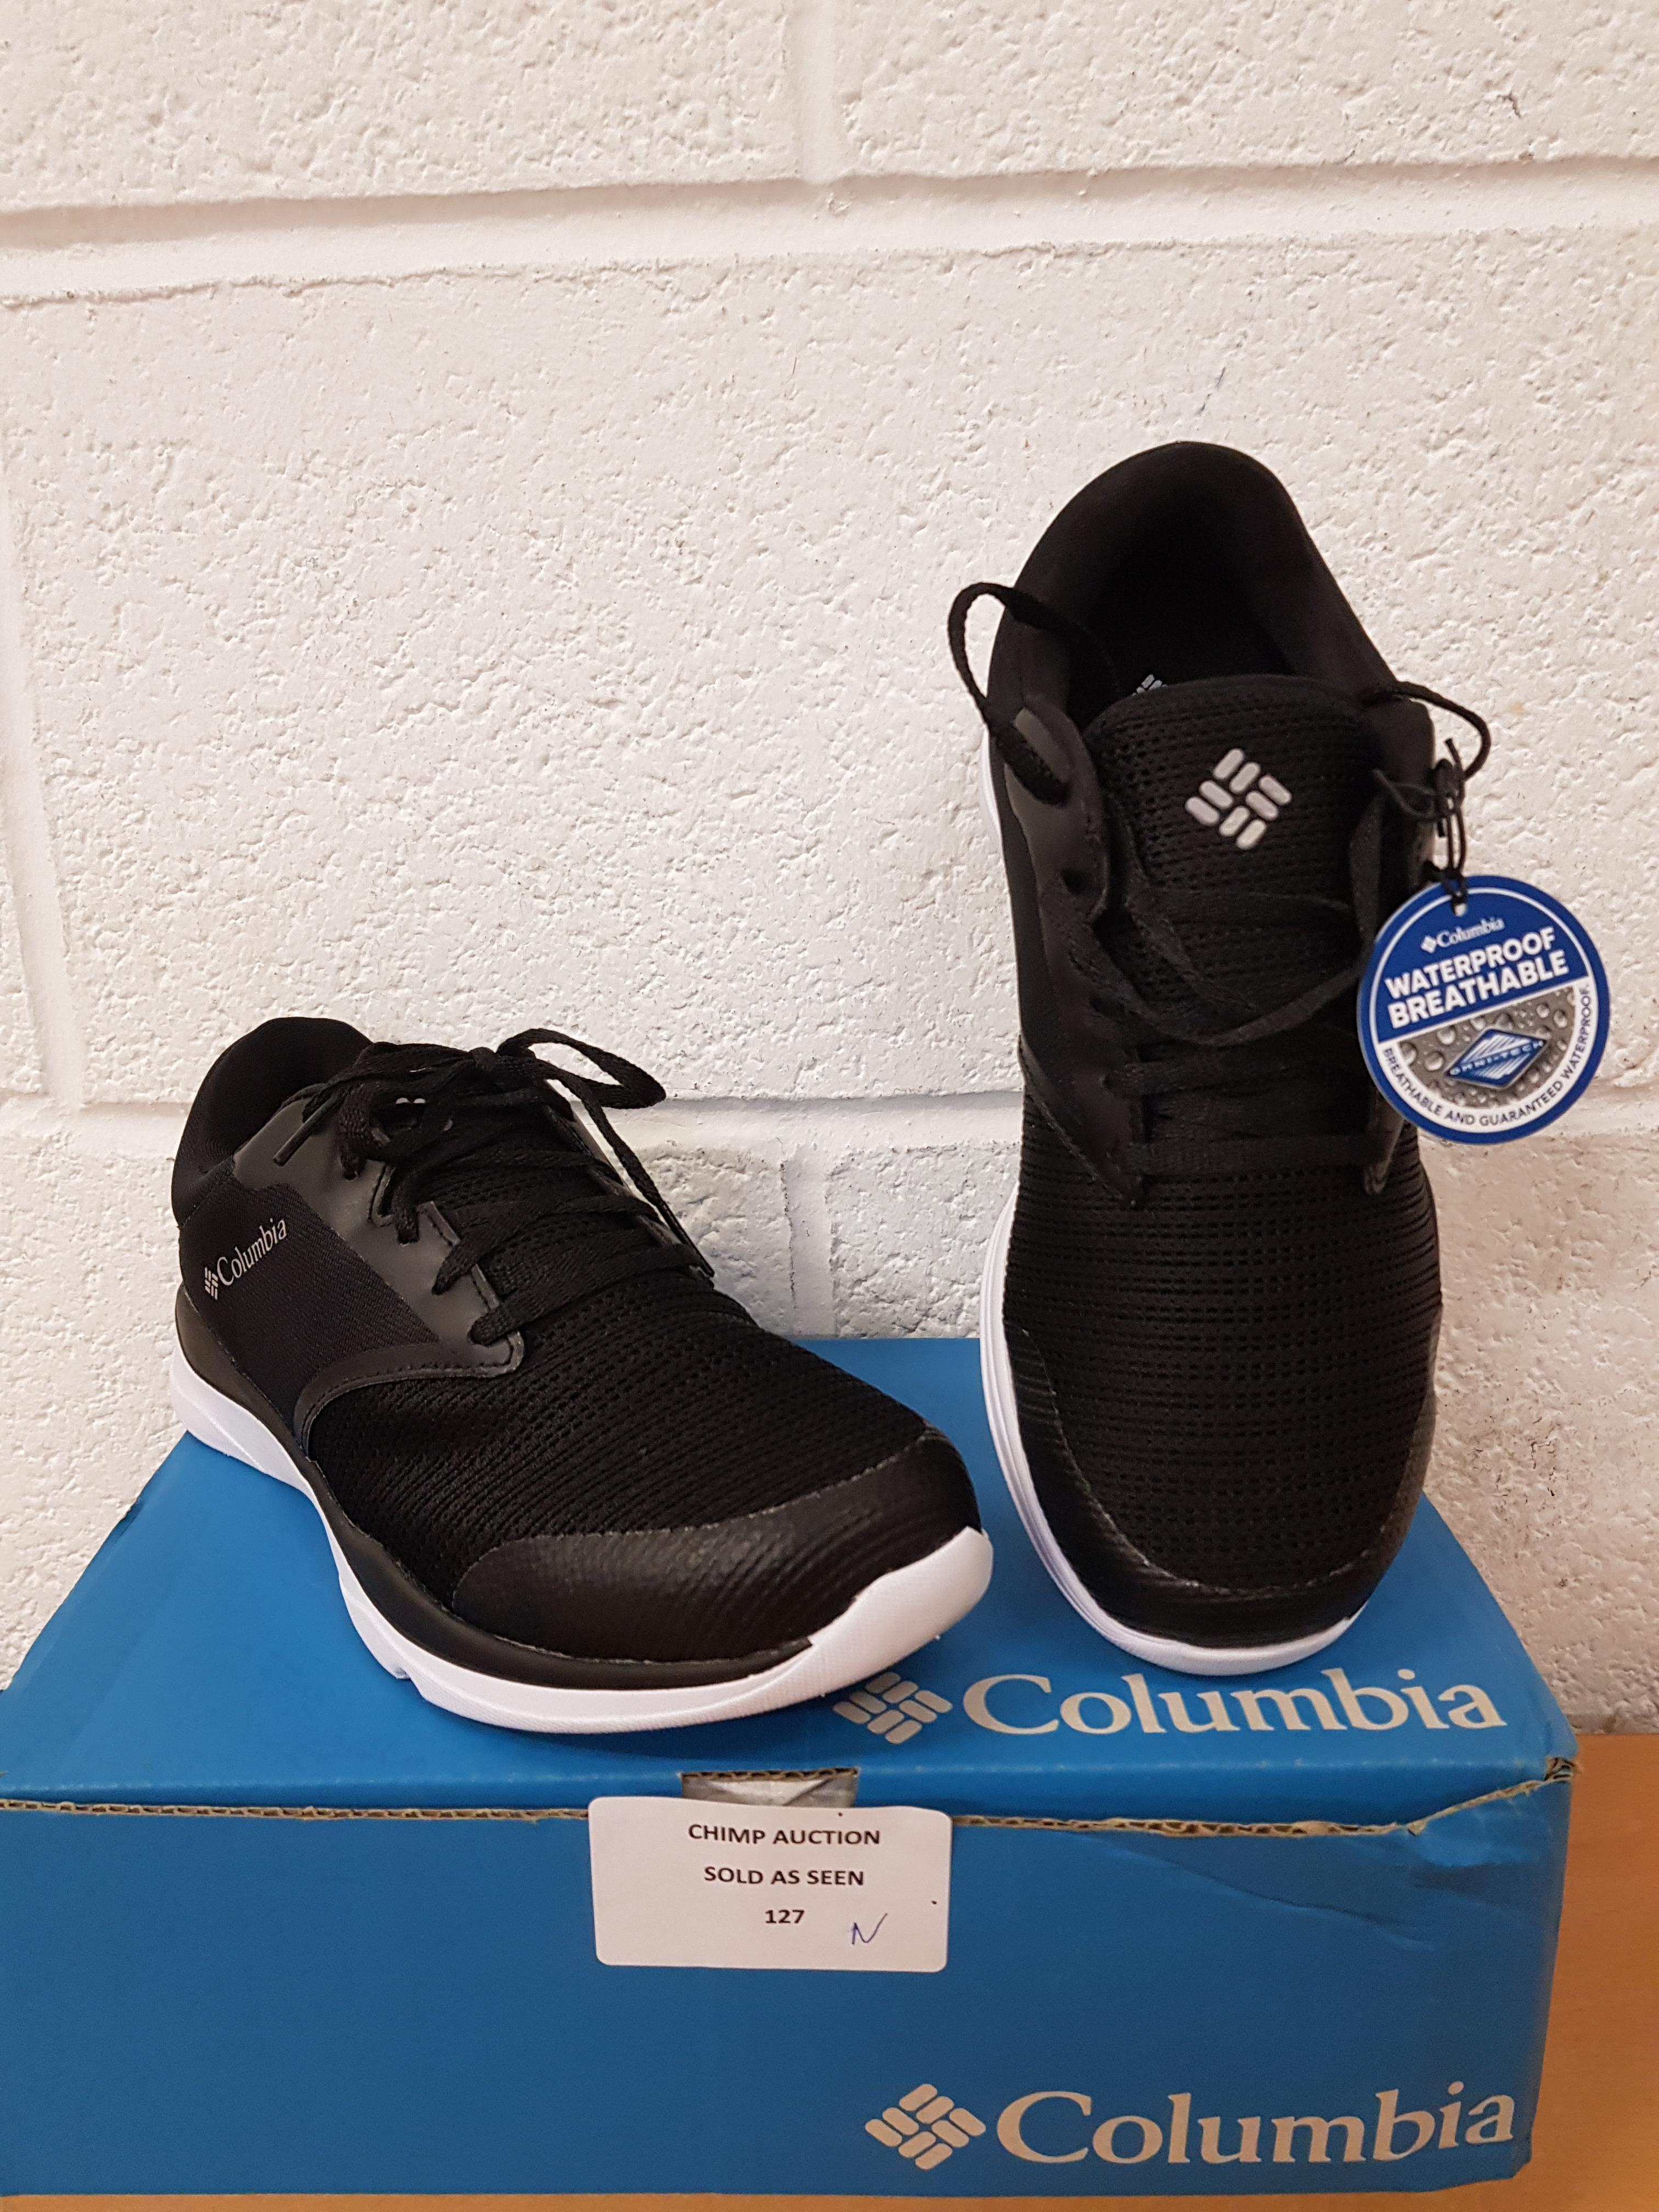 Lot 127 - Brand new Columbia ladies trainers UK 5